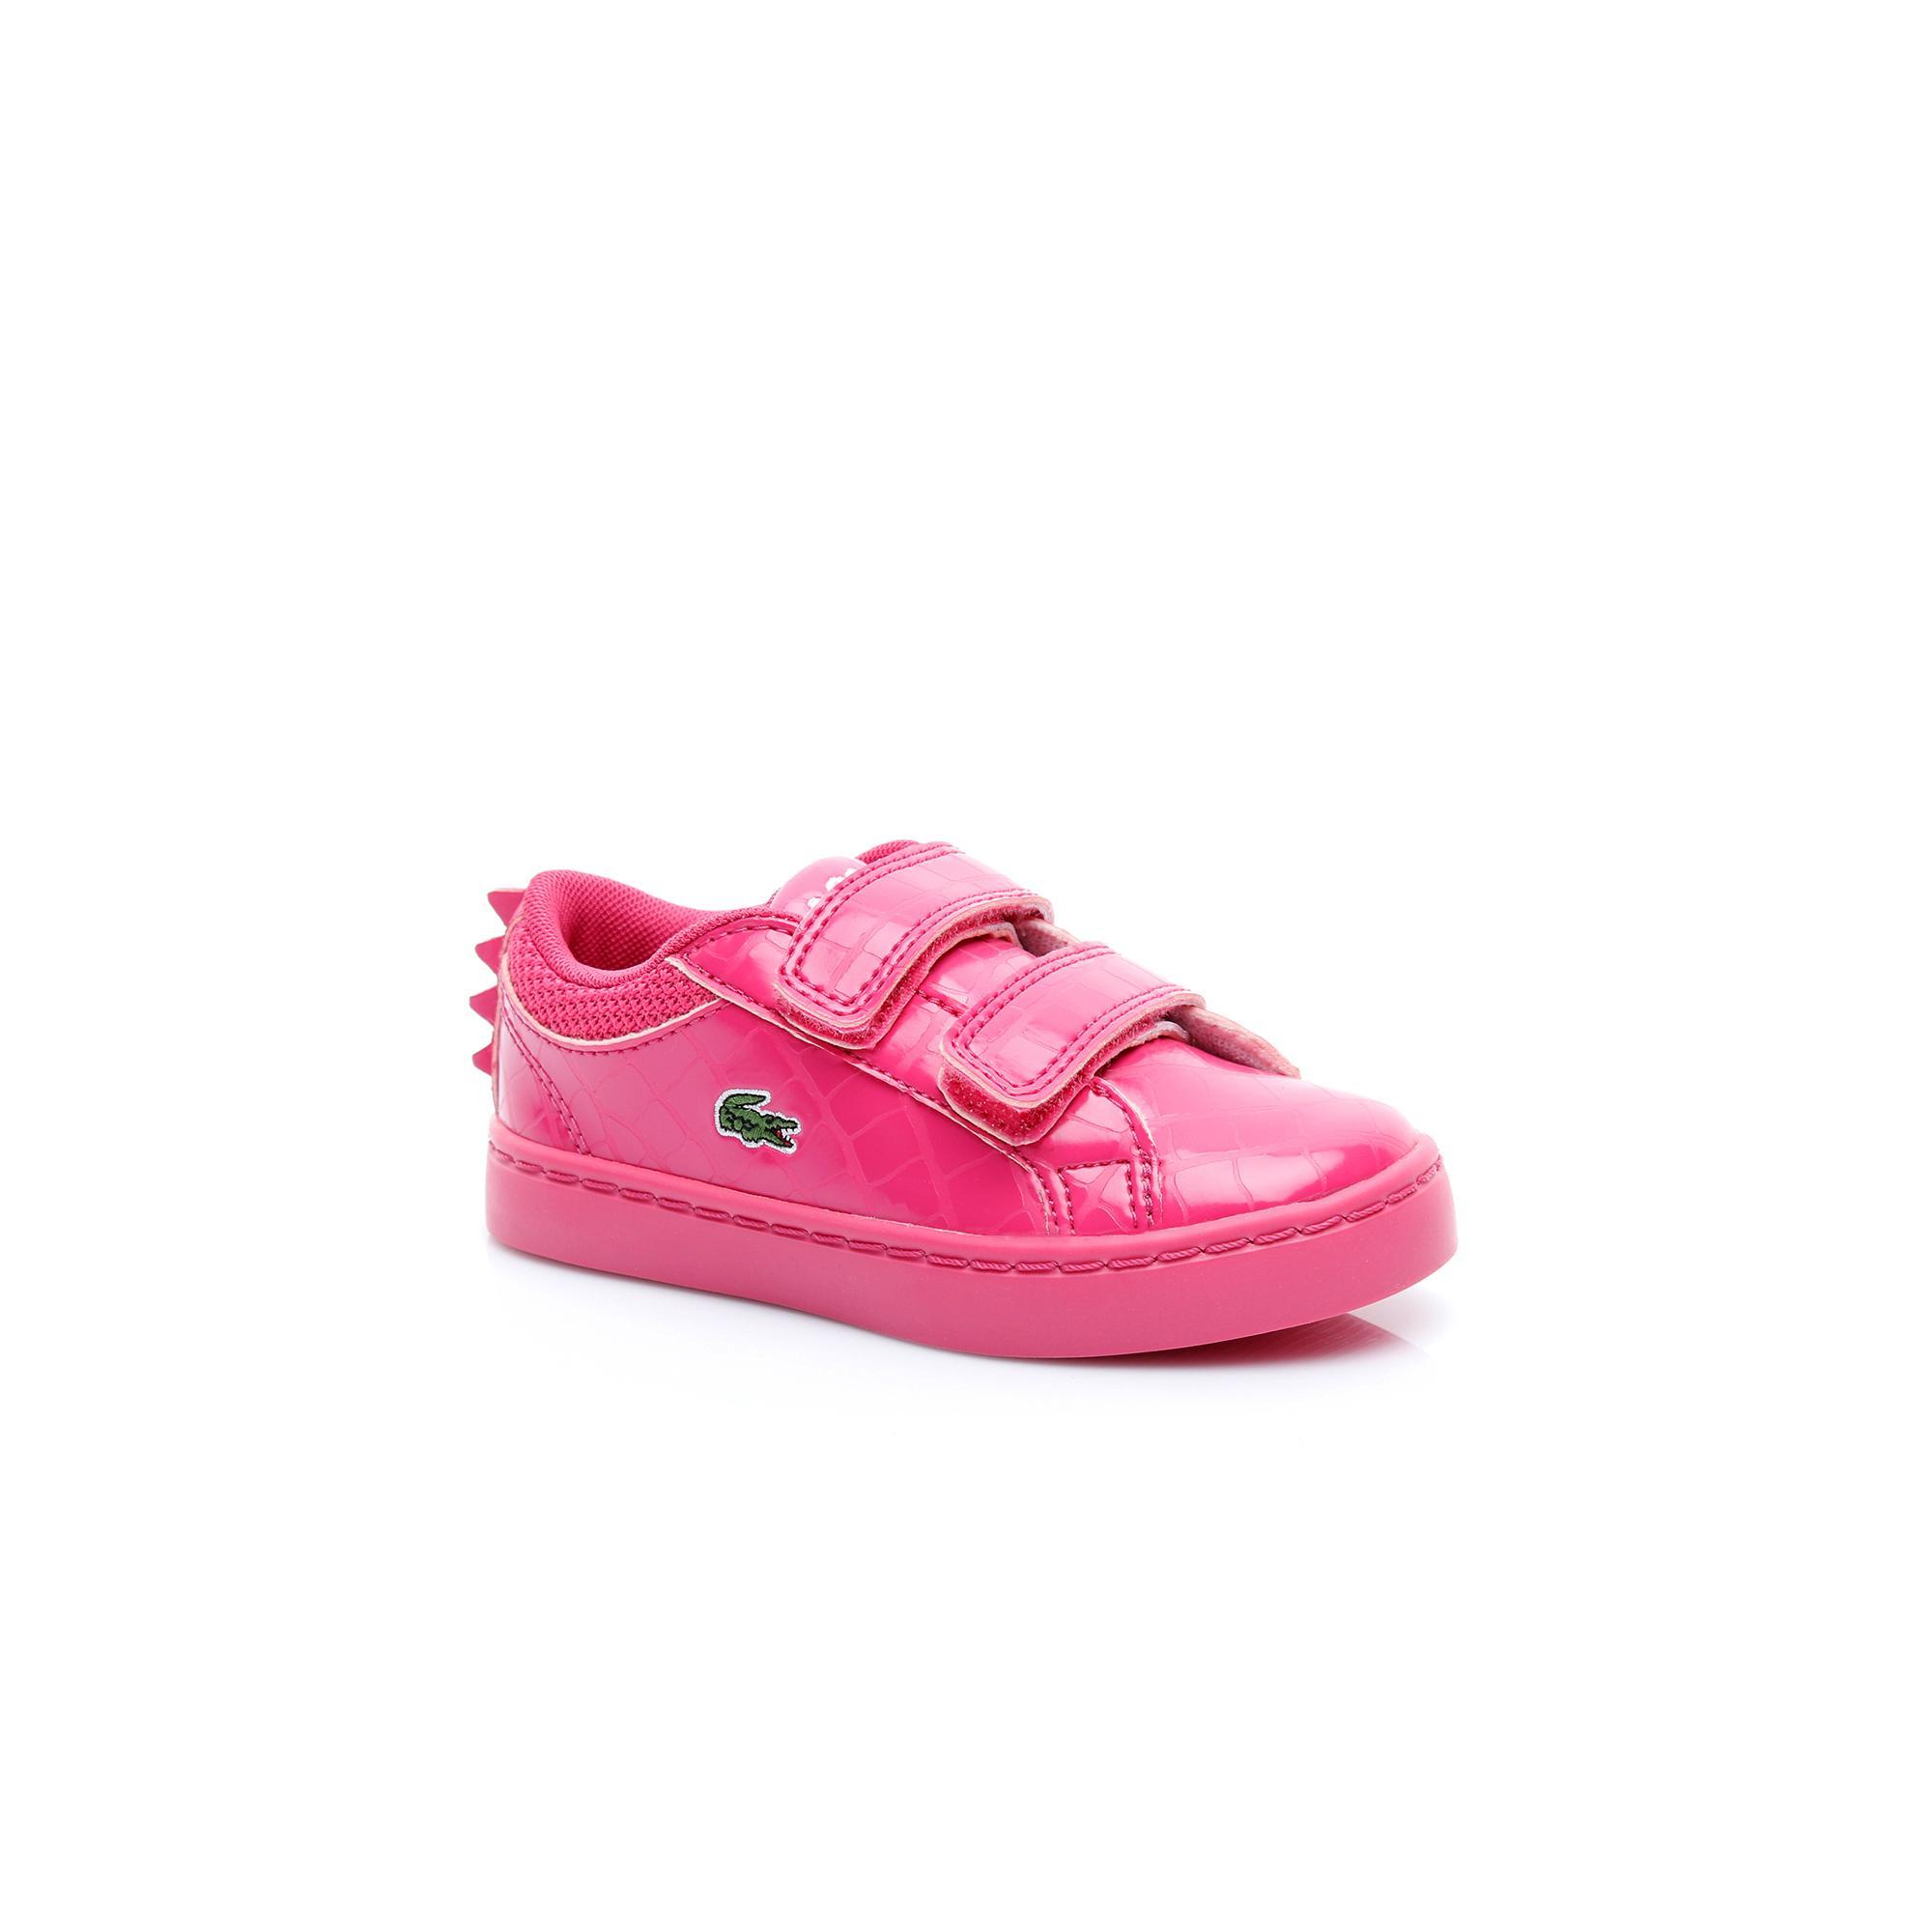 Lacoste Çocuk Koyu Pembe Straightset 119 4 Casual Ayakkabı